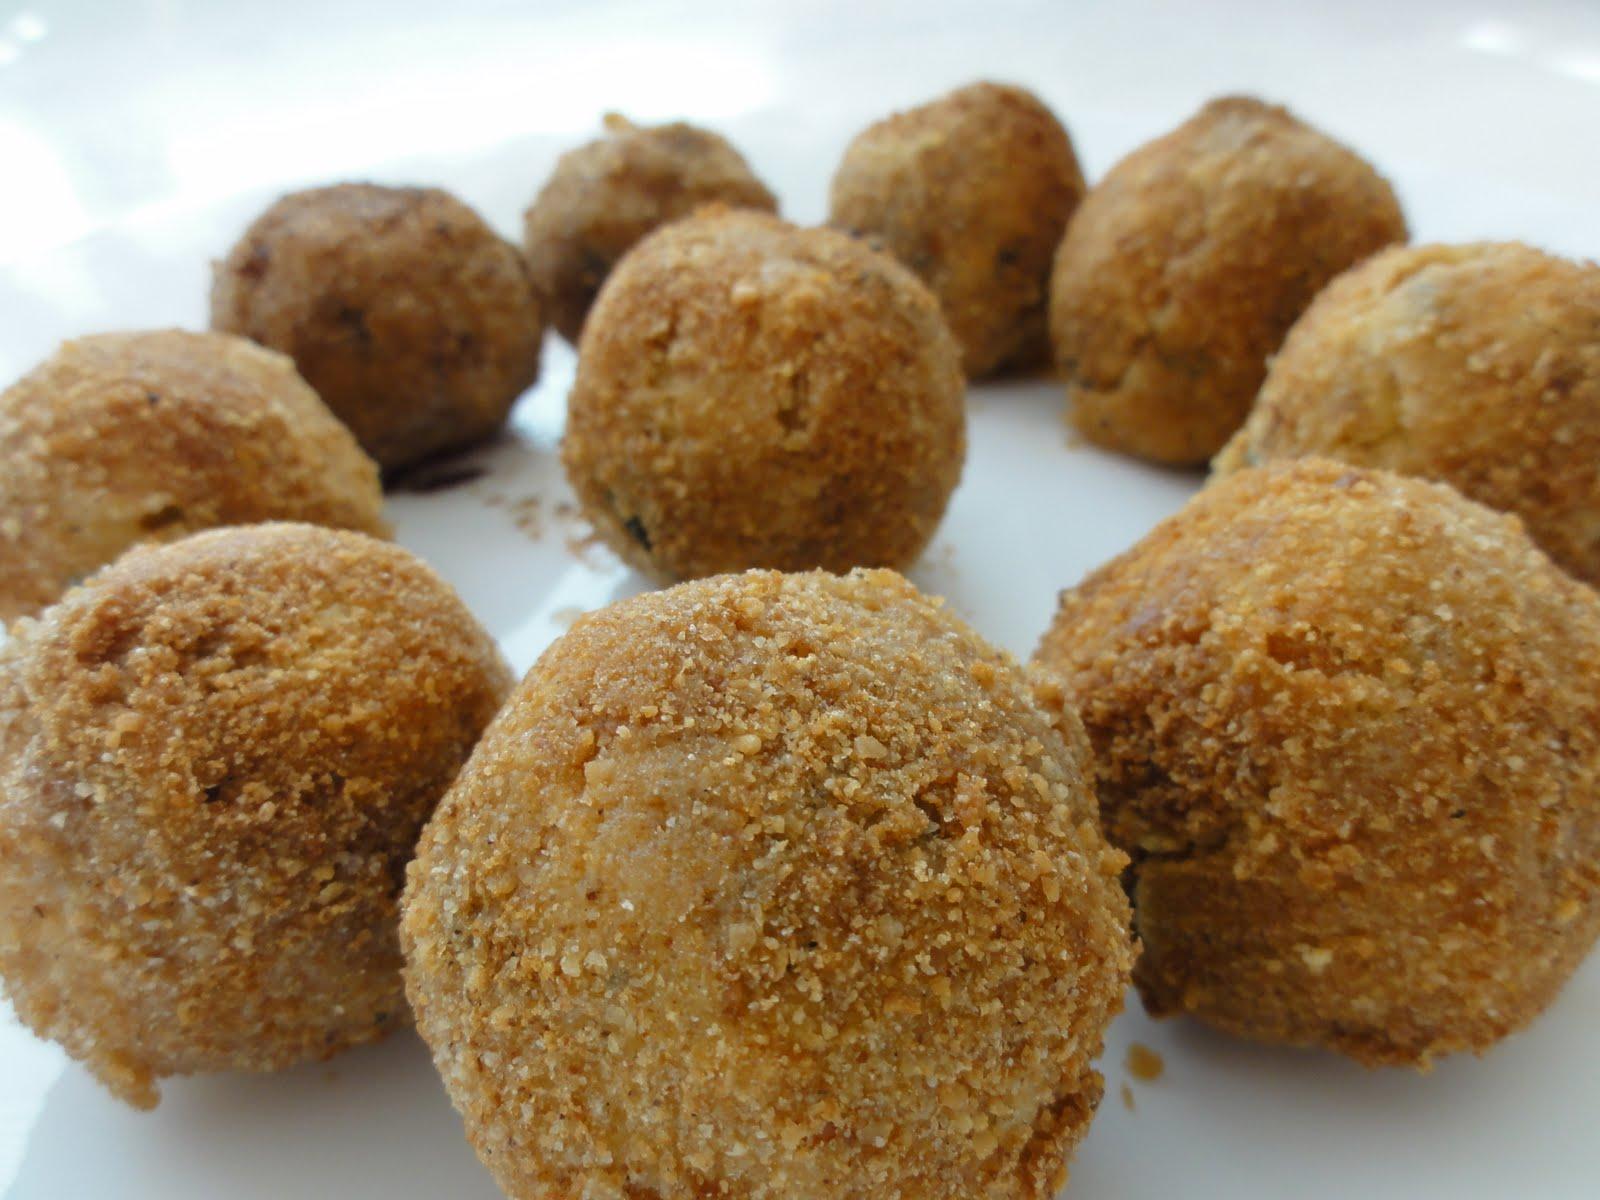 Rathai's Recipes: Falafel (chickpea cutlets)